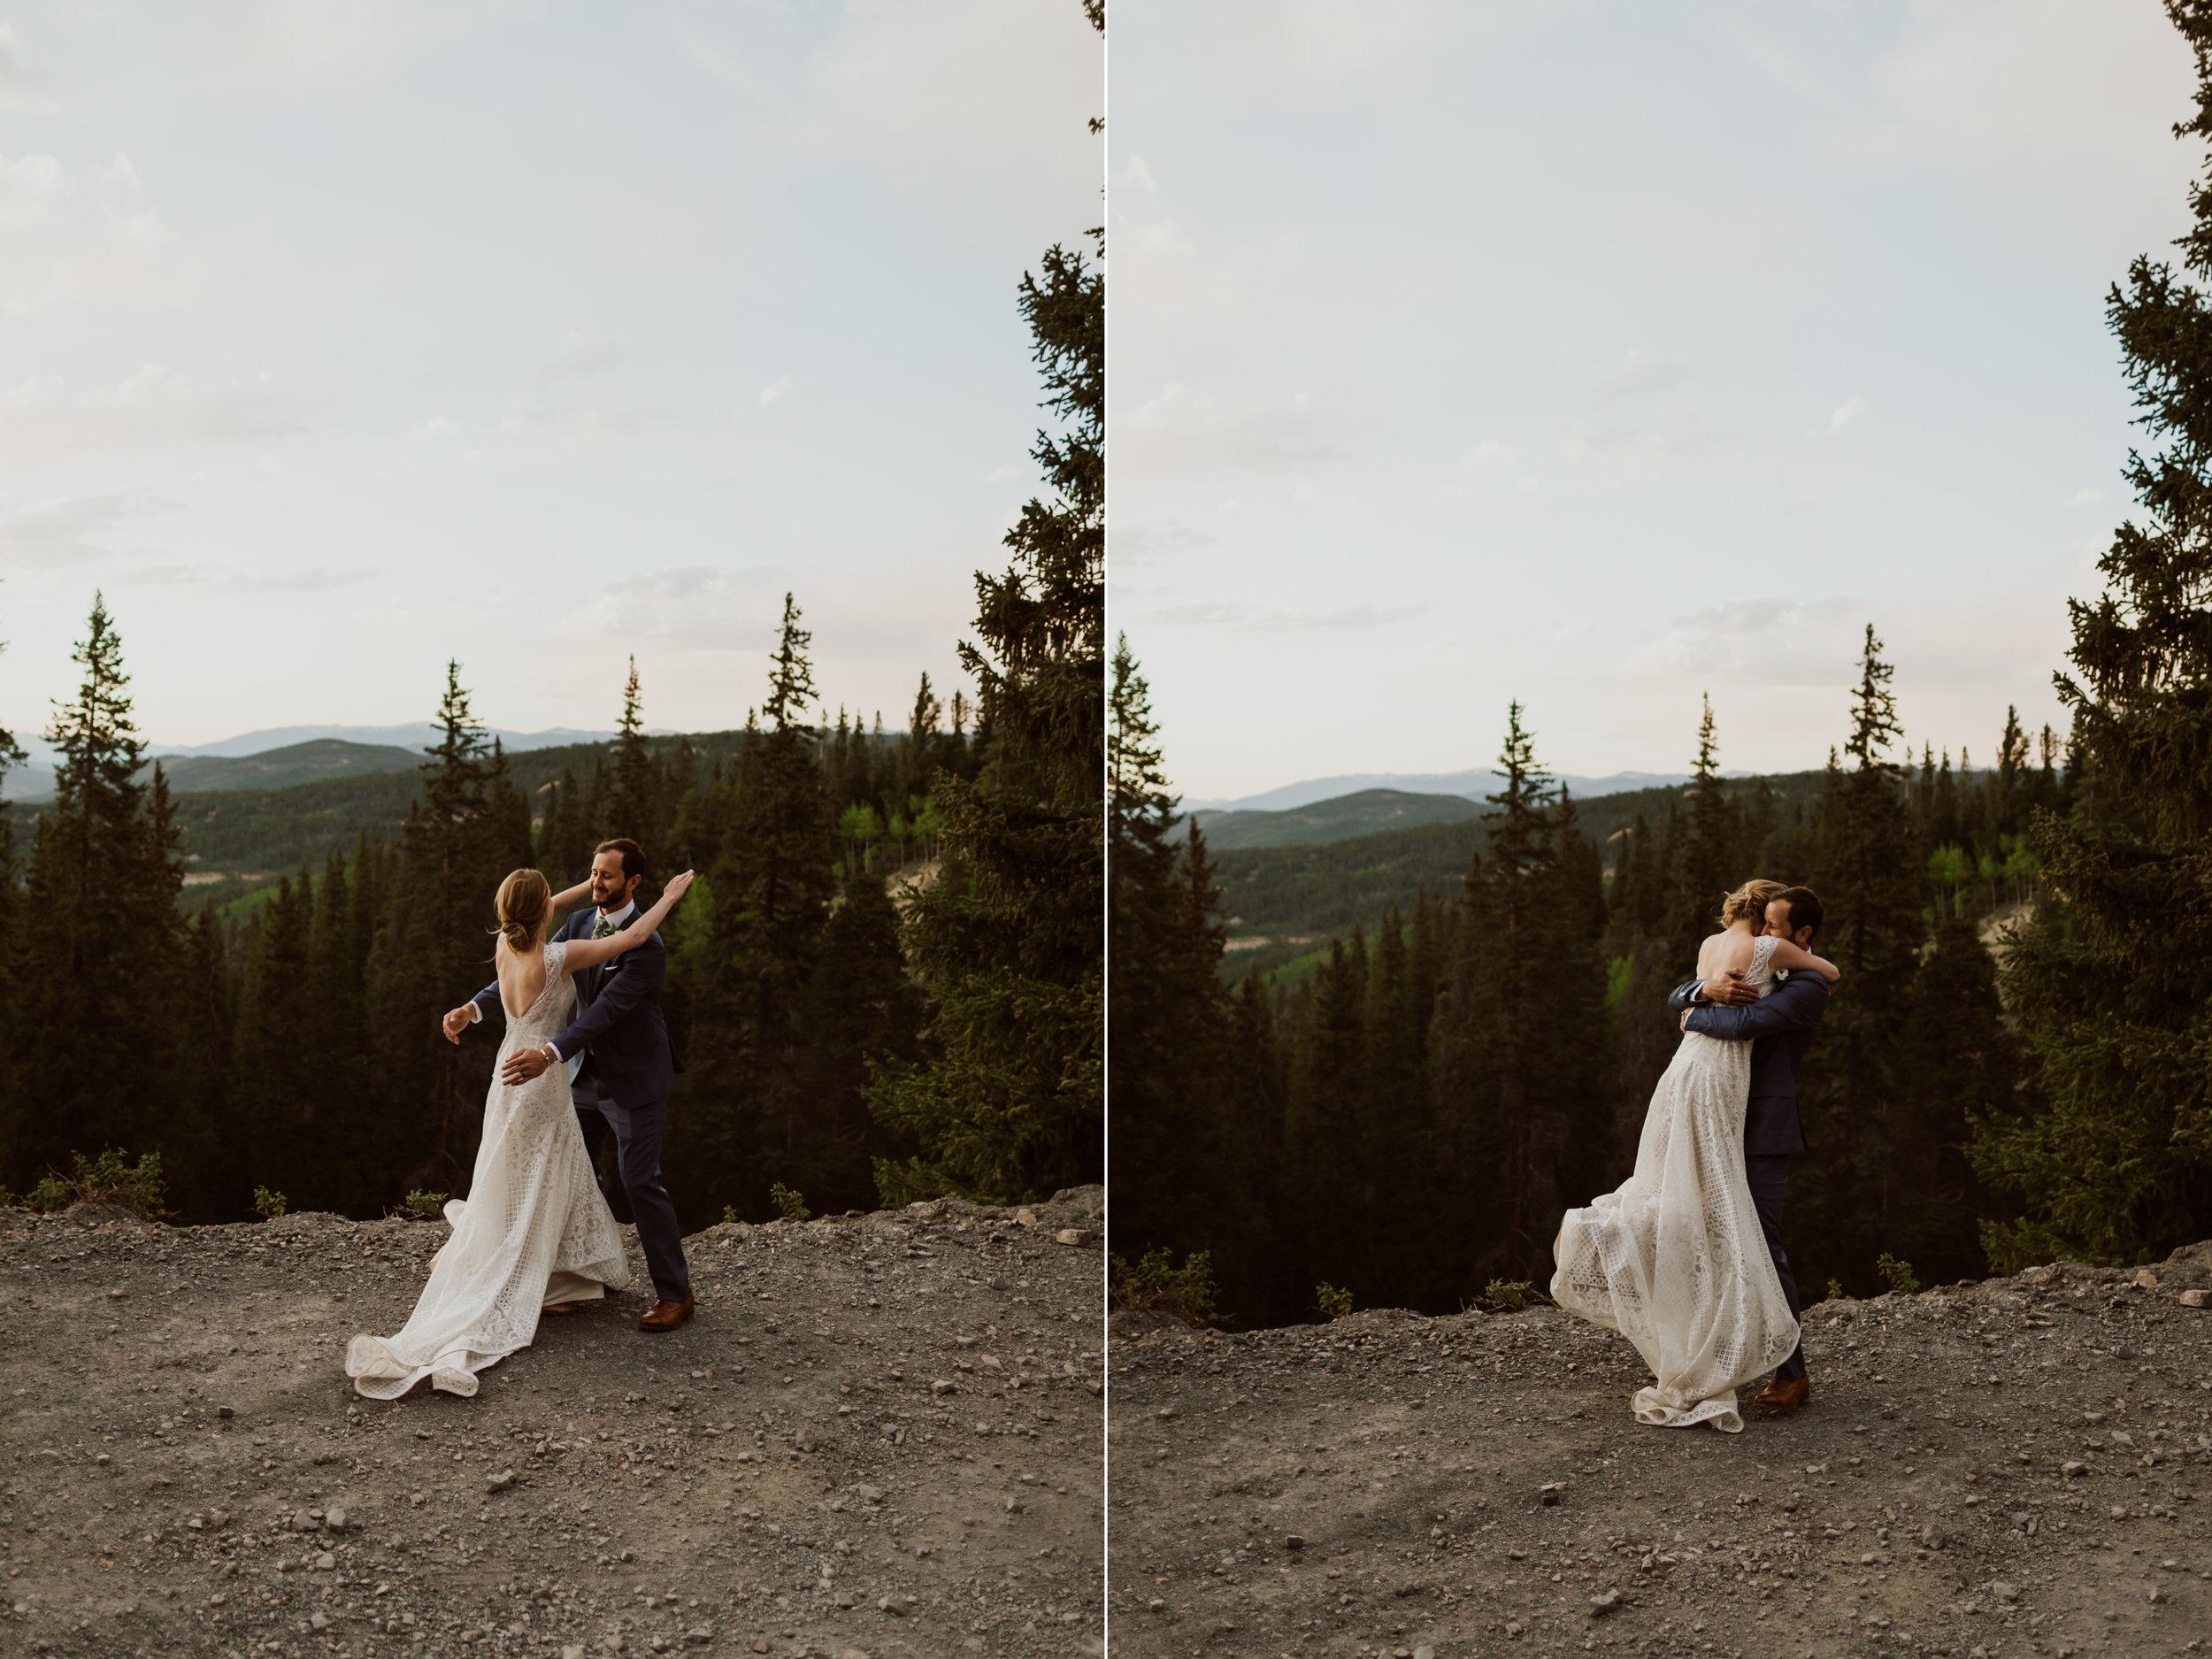 bohemian-backyard-wedding-breckenridge-colorado-177.jpg